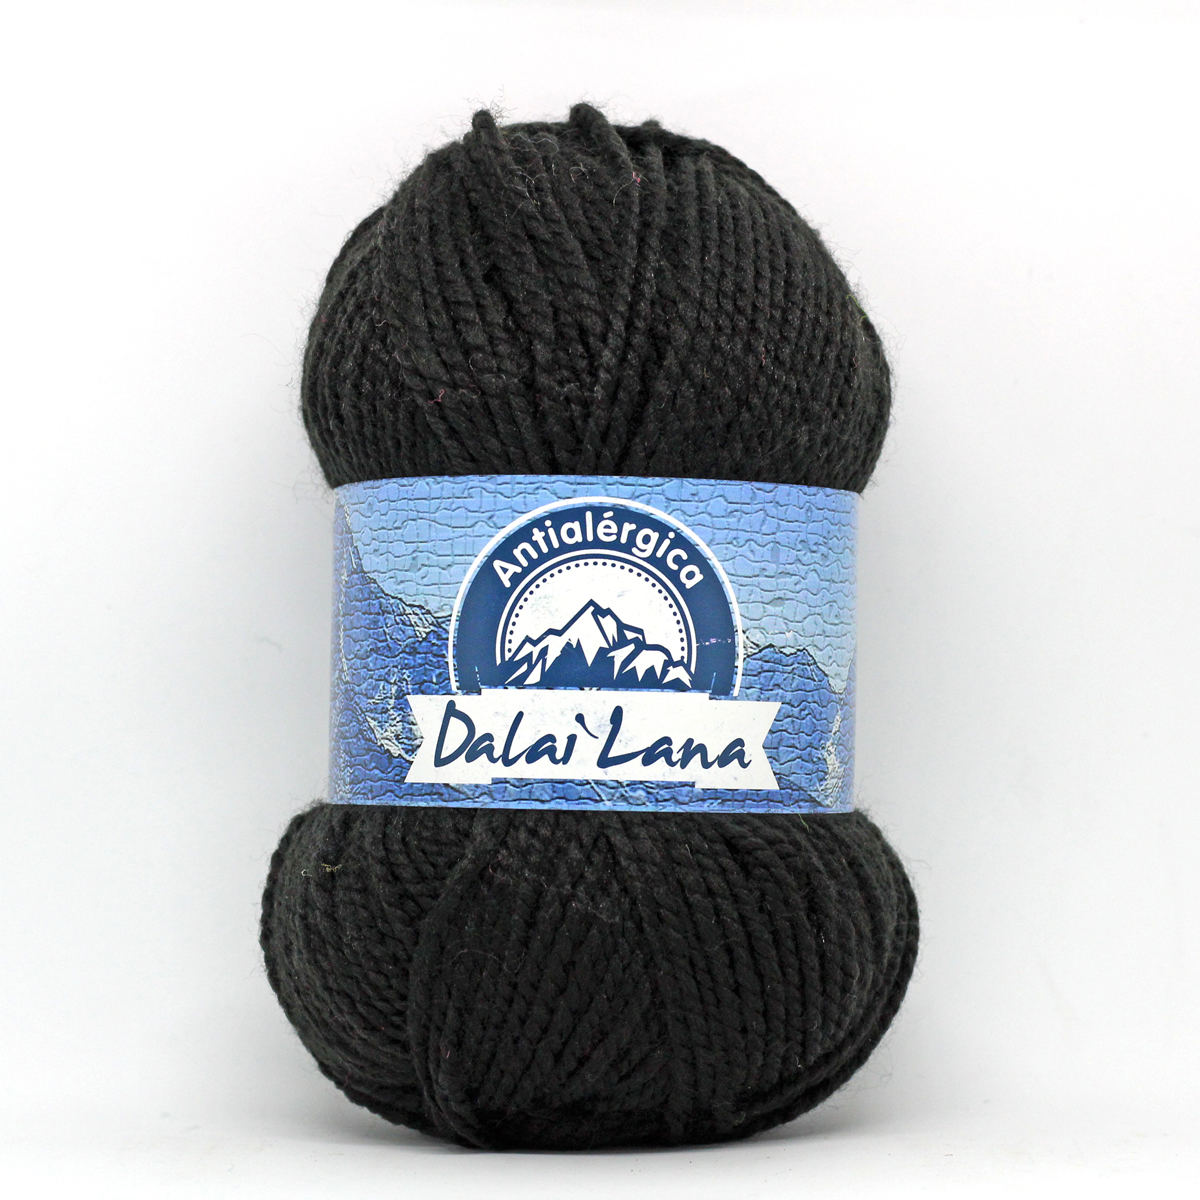 Dalai Lana - 773